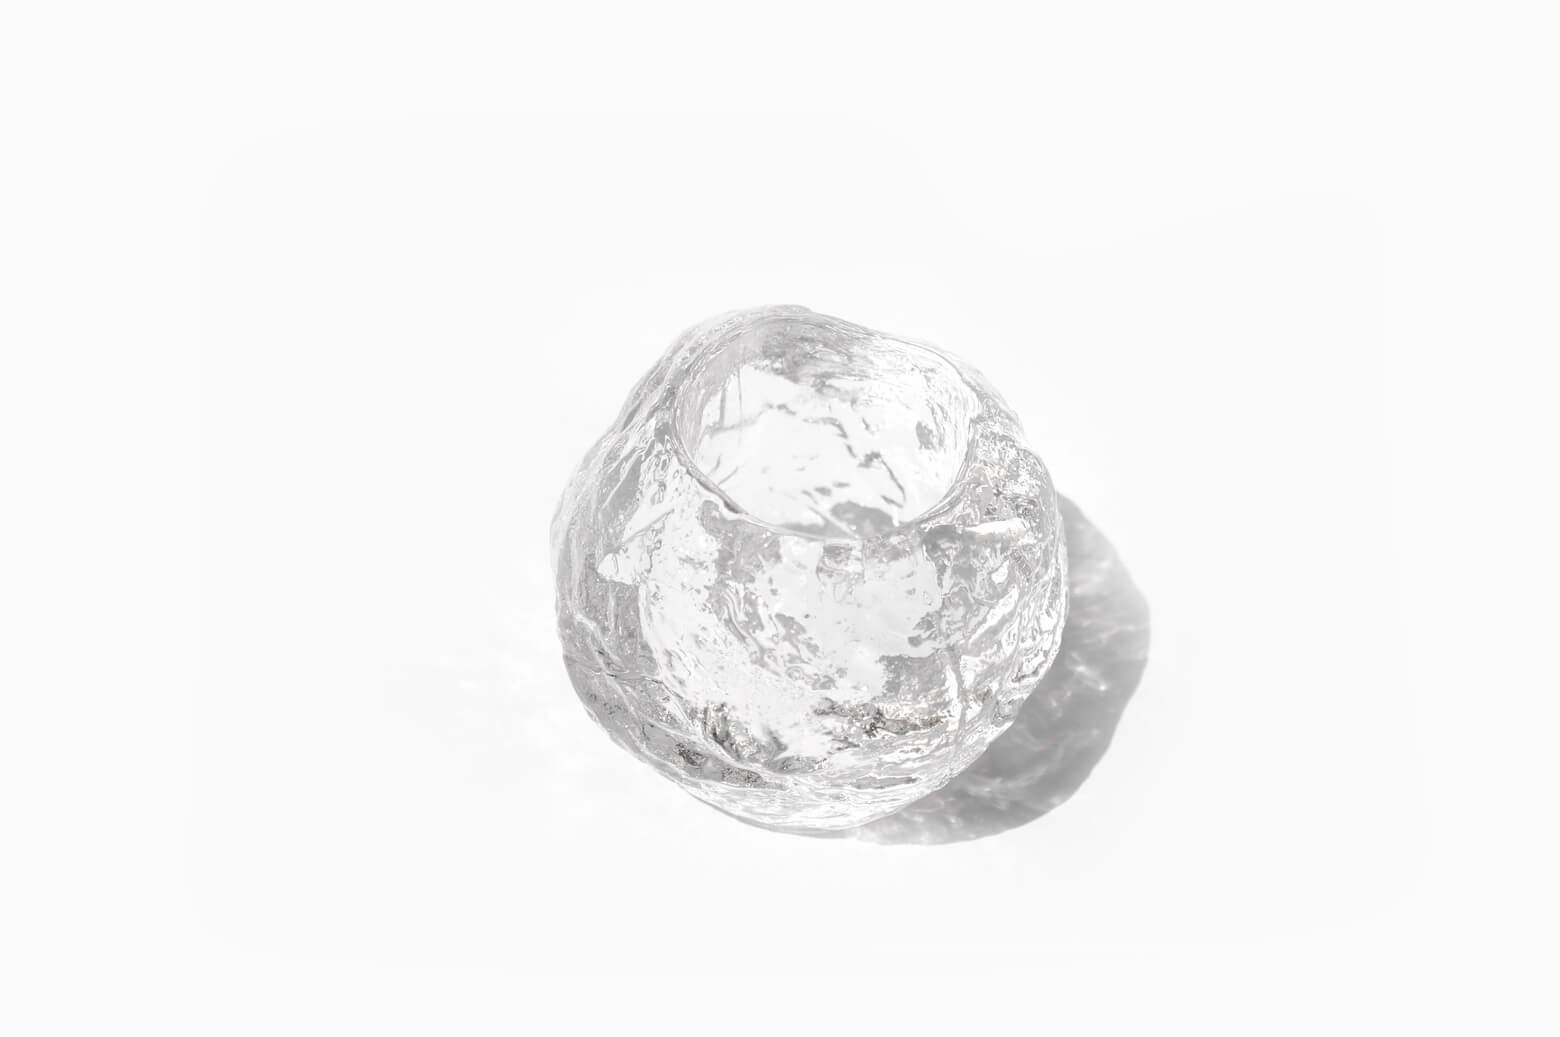 Kosta Boda Snow Ball Candle Holder Ann Wolff/コスタボダ キャンドルホルダー スノーボール アン・ウォルフ ガラス 北欧雑貨 Mサイズ